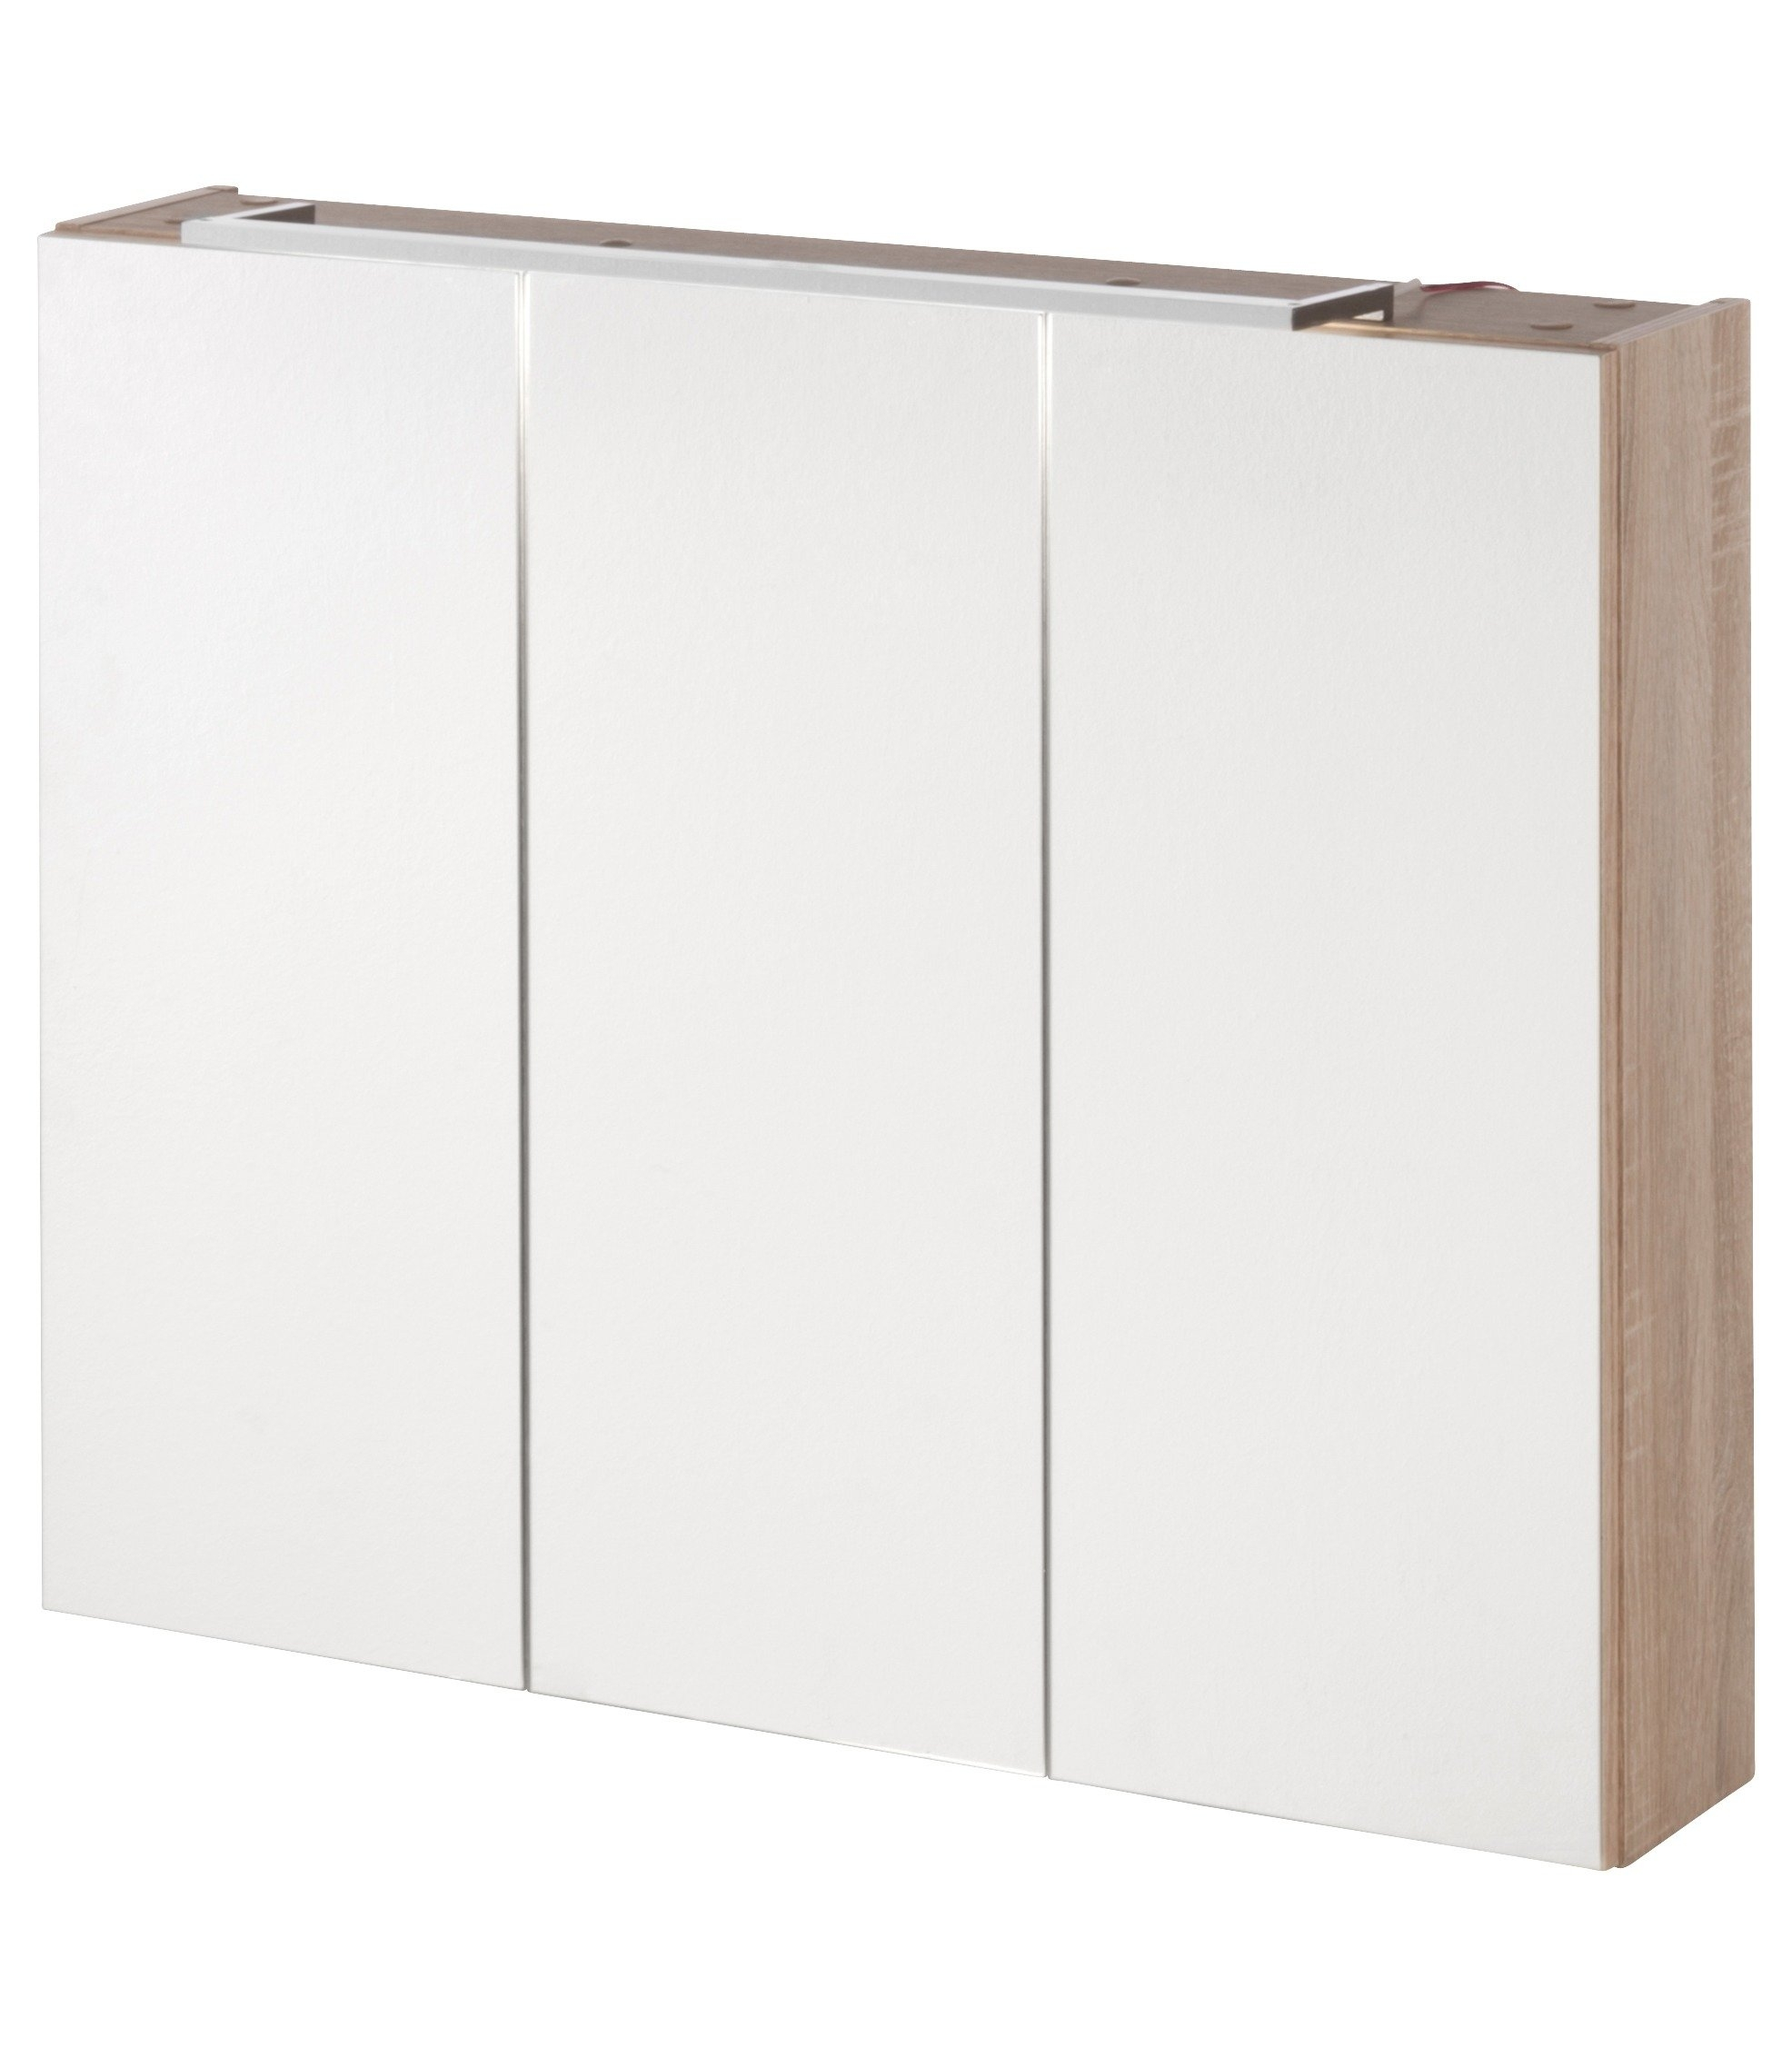 Kesper spiegelkast montana breedte 80 cm makkelijk for Spiegelkast 80 cm